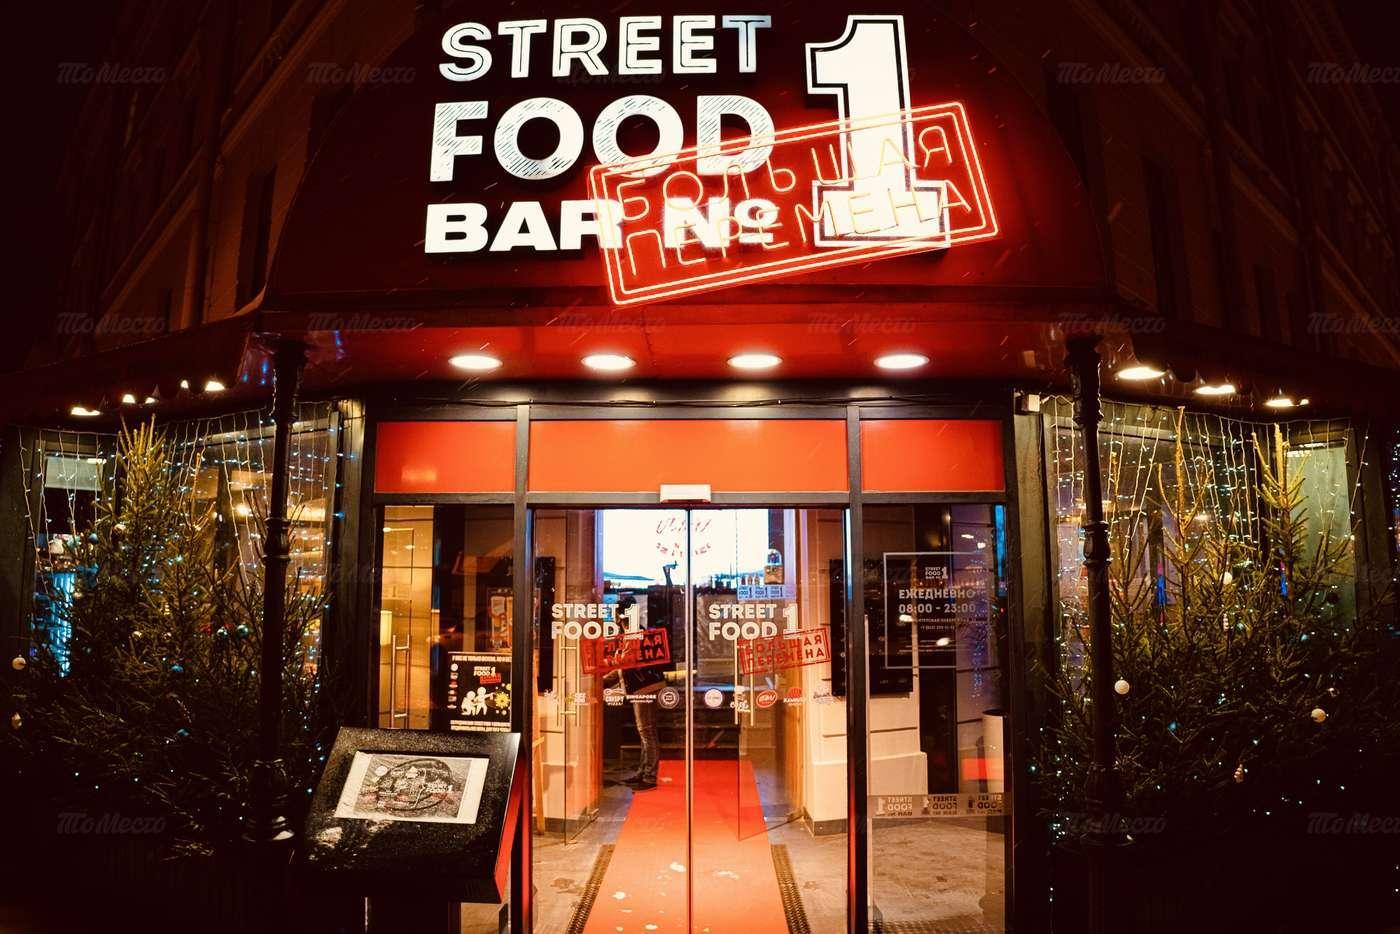 Ресторан Street food bar №1 (Стрит фуд бар №1) на Университетской набережной фото 19